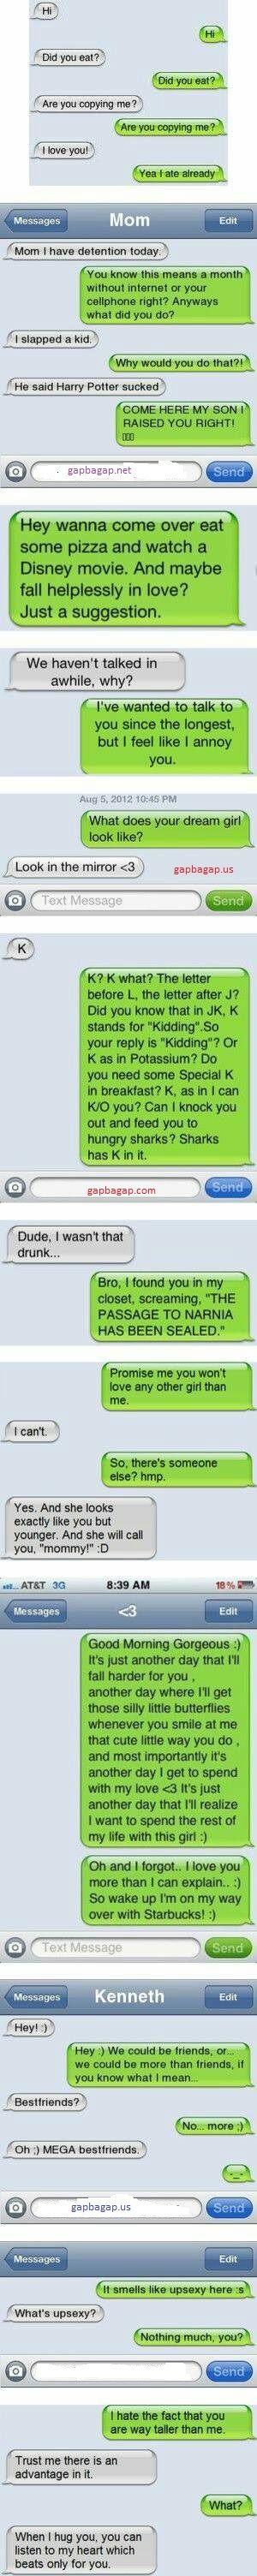 Top 10 #Hilarious Text Messages